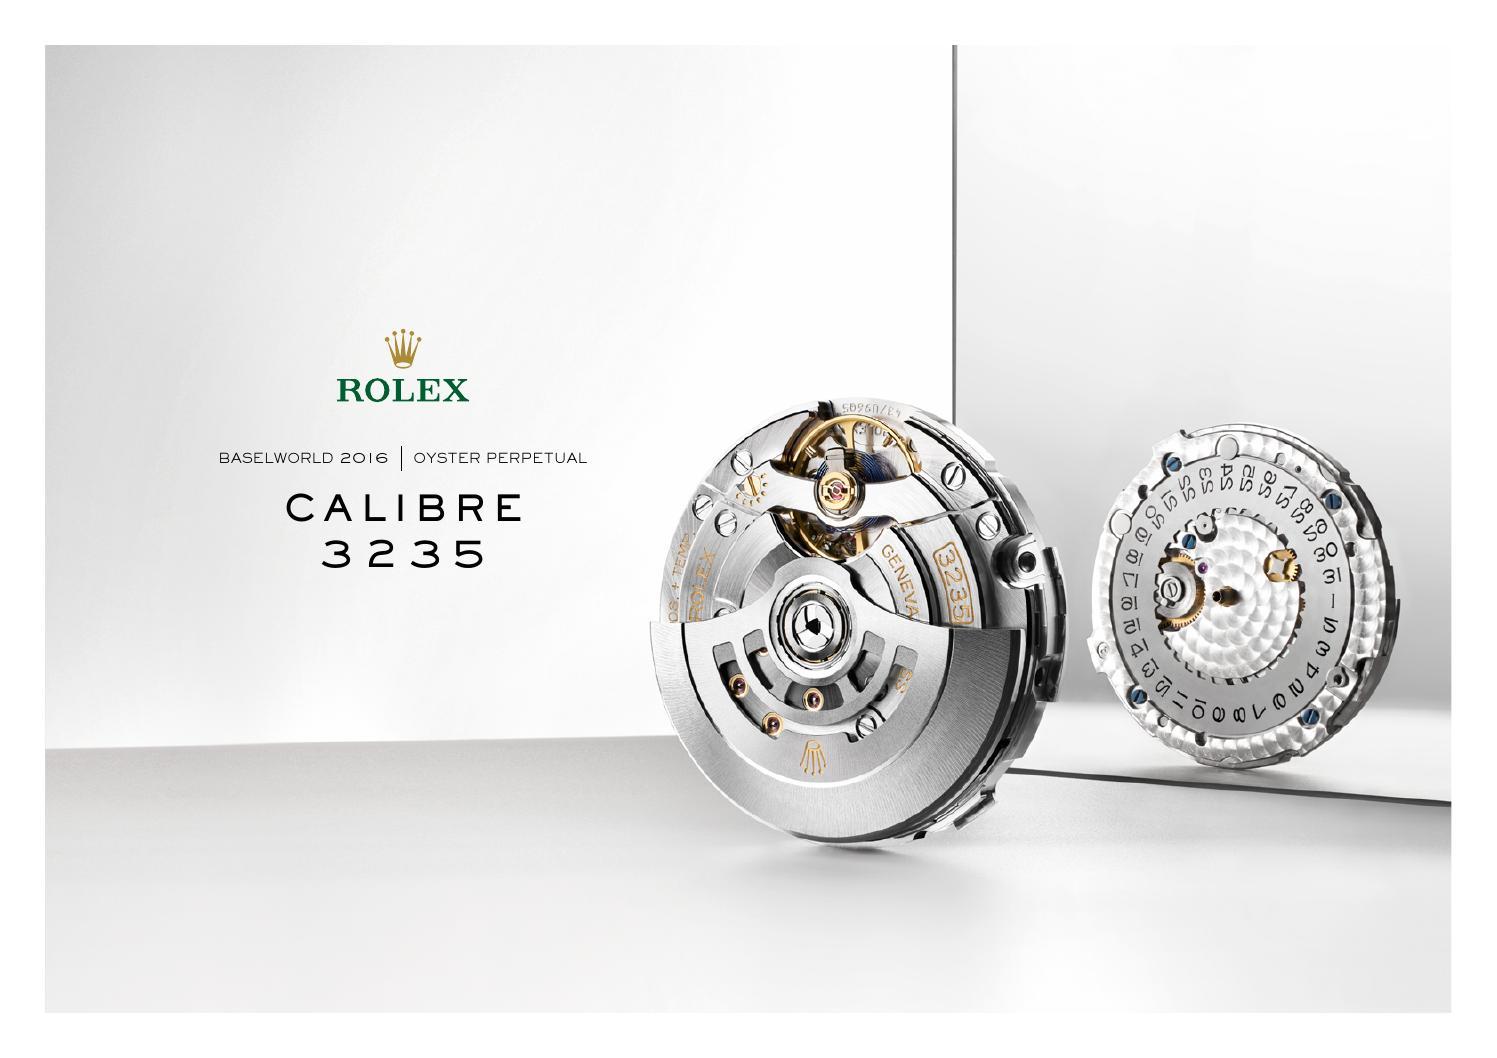 Calibre Rolex 3235